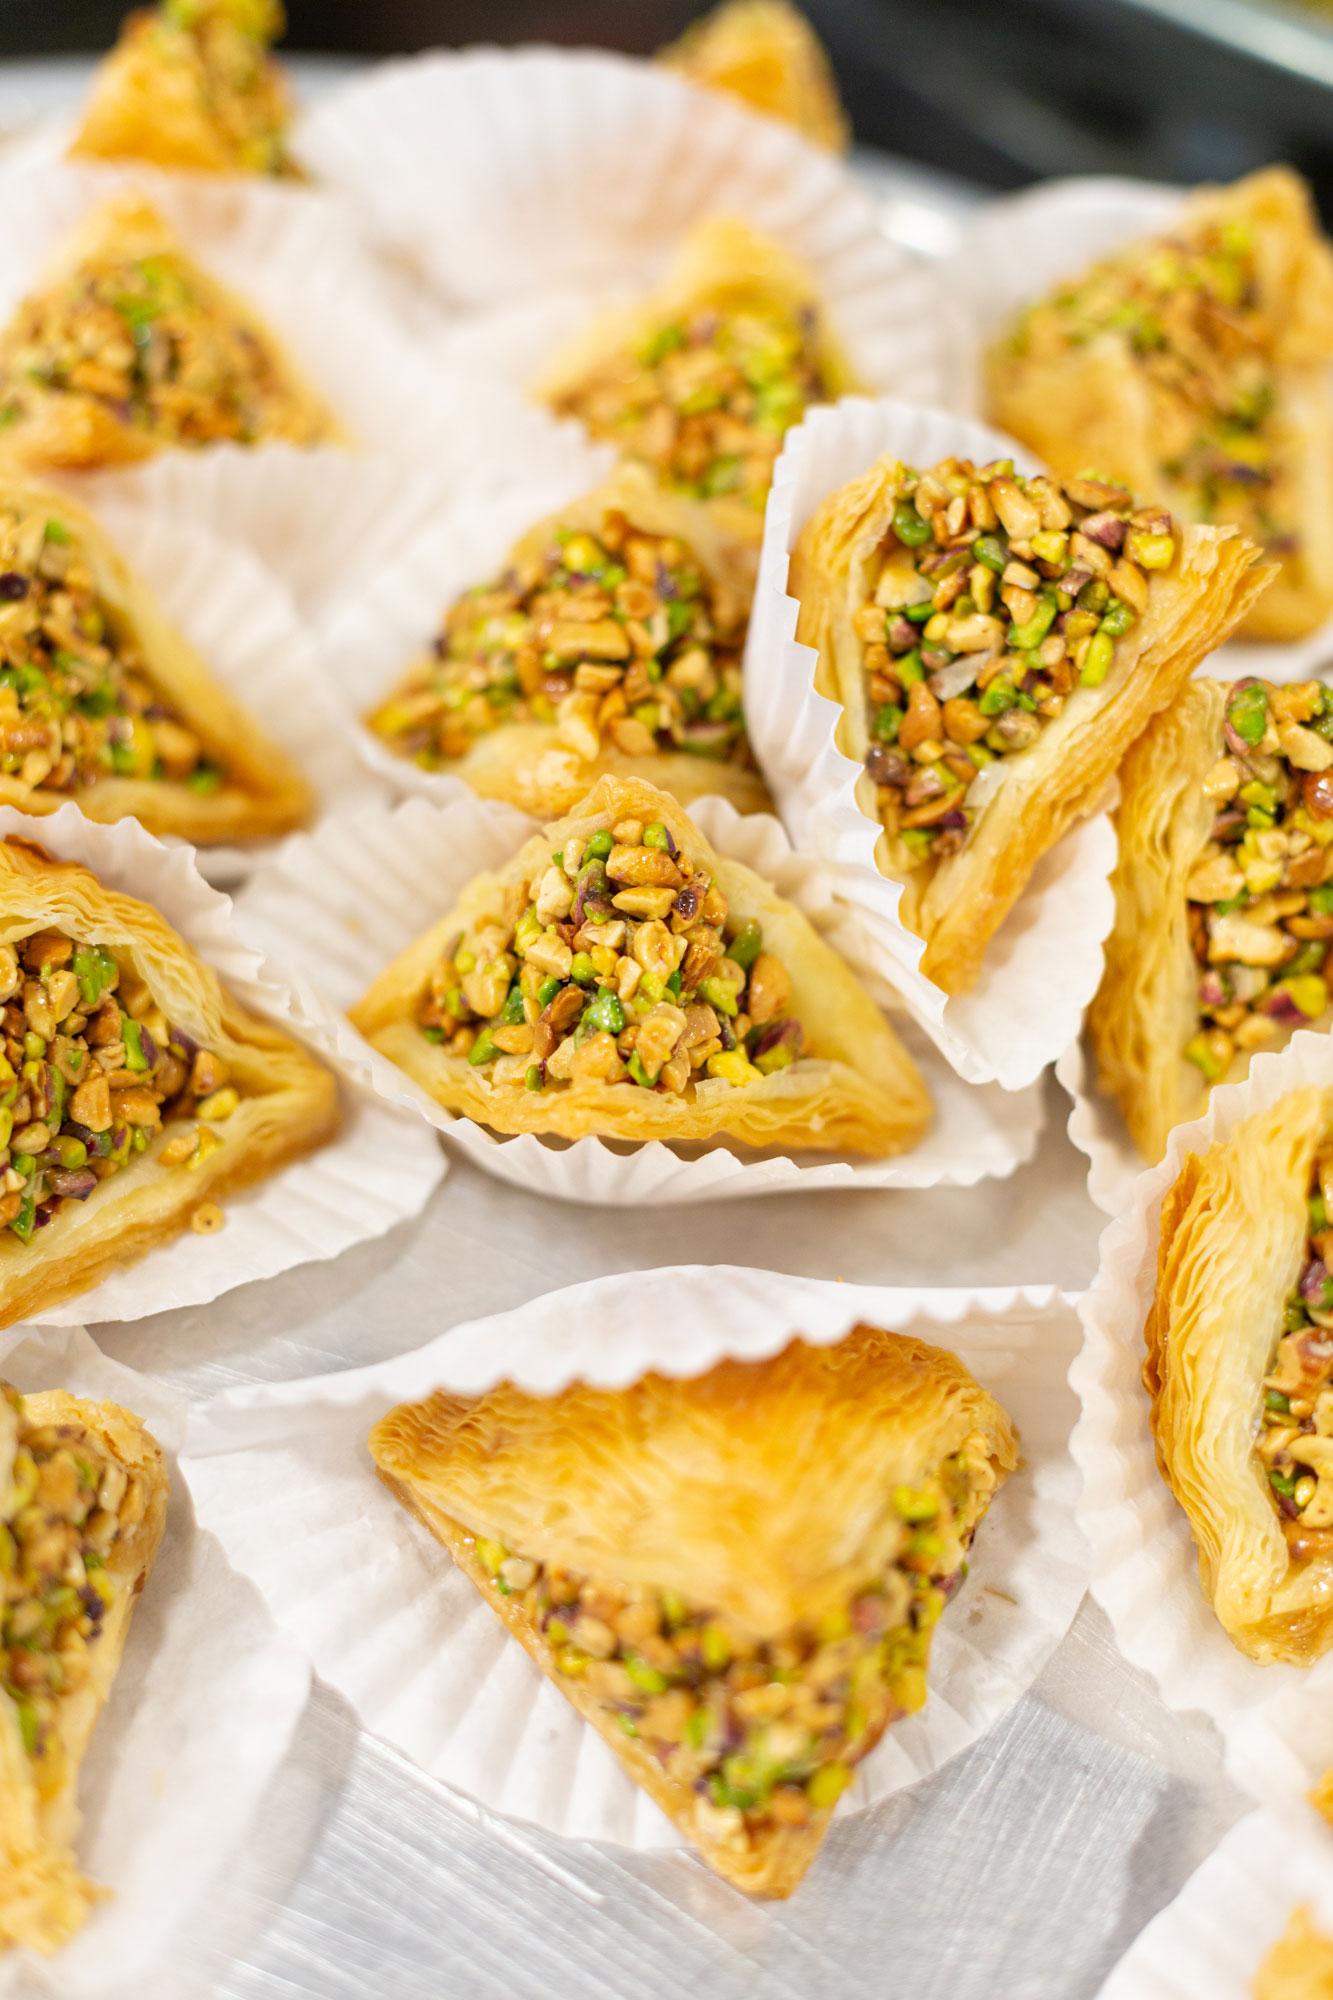 voyage en Jordanie baklawas pistaches